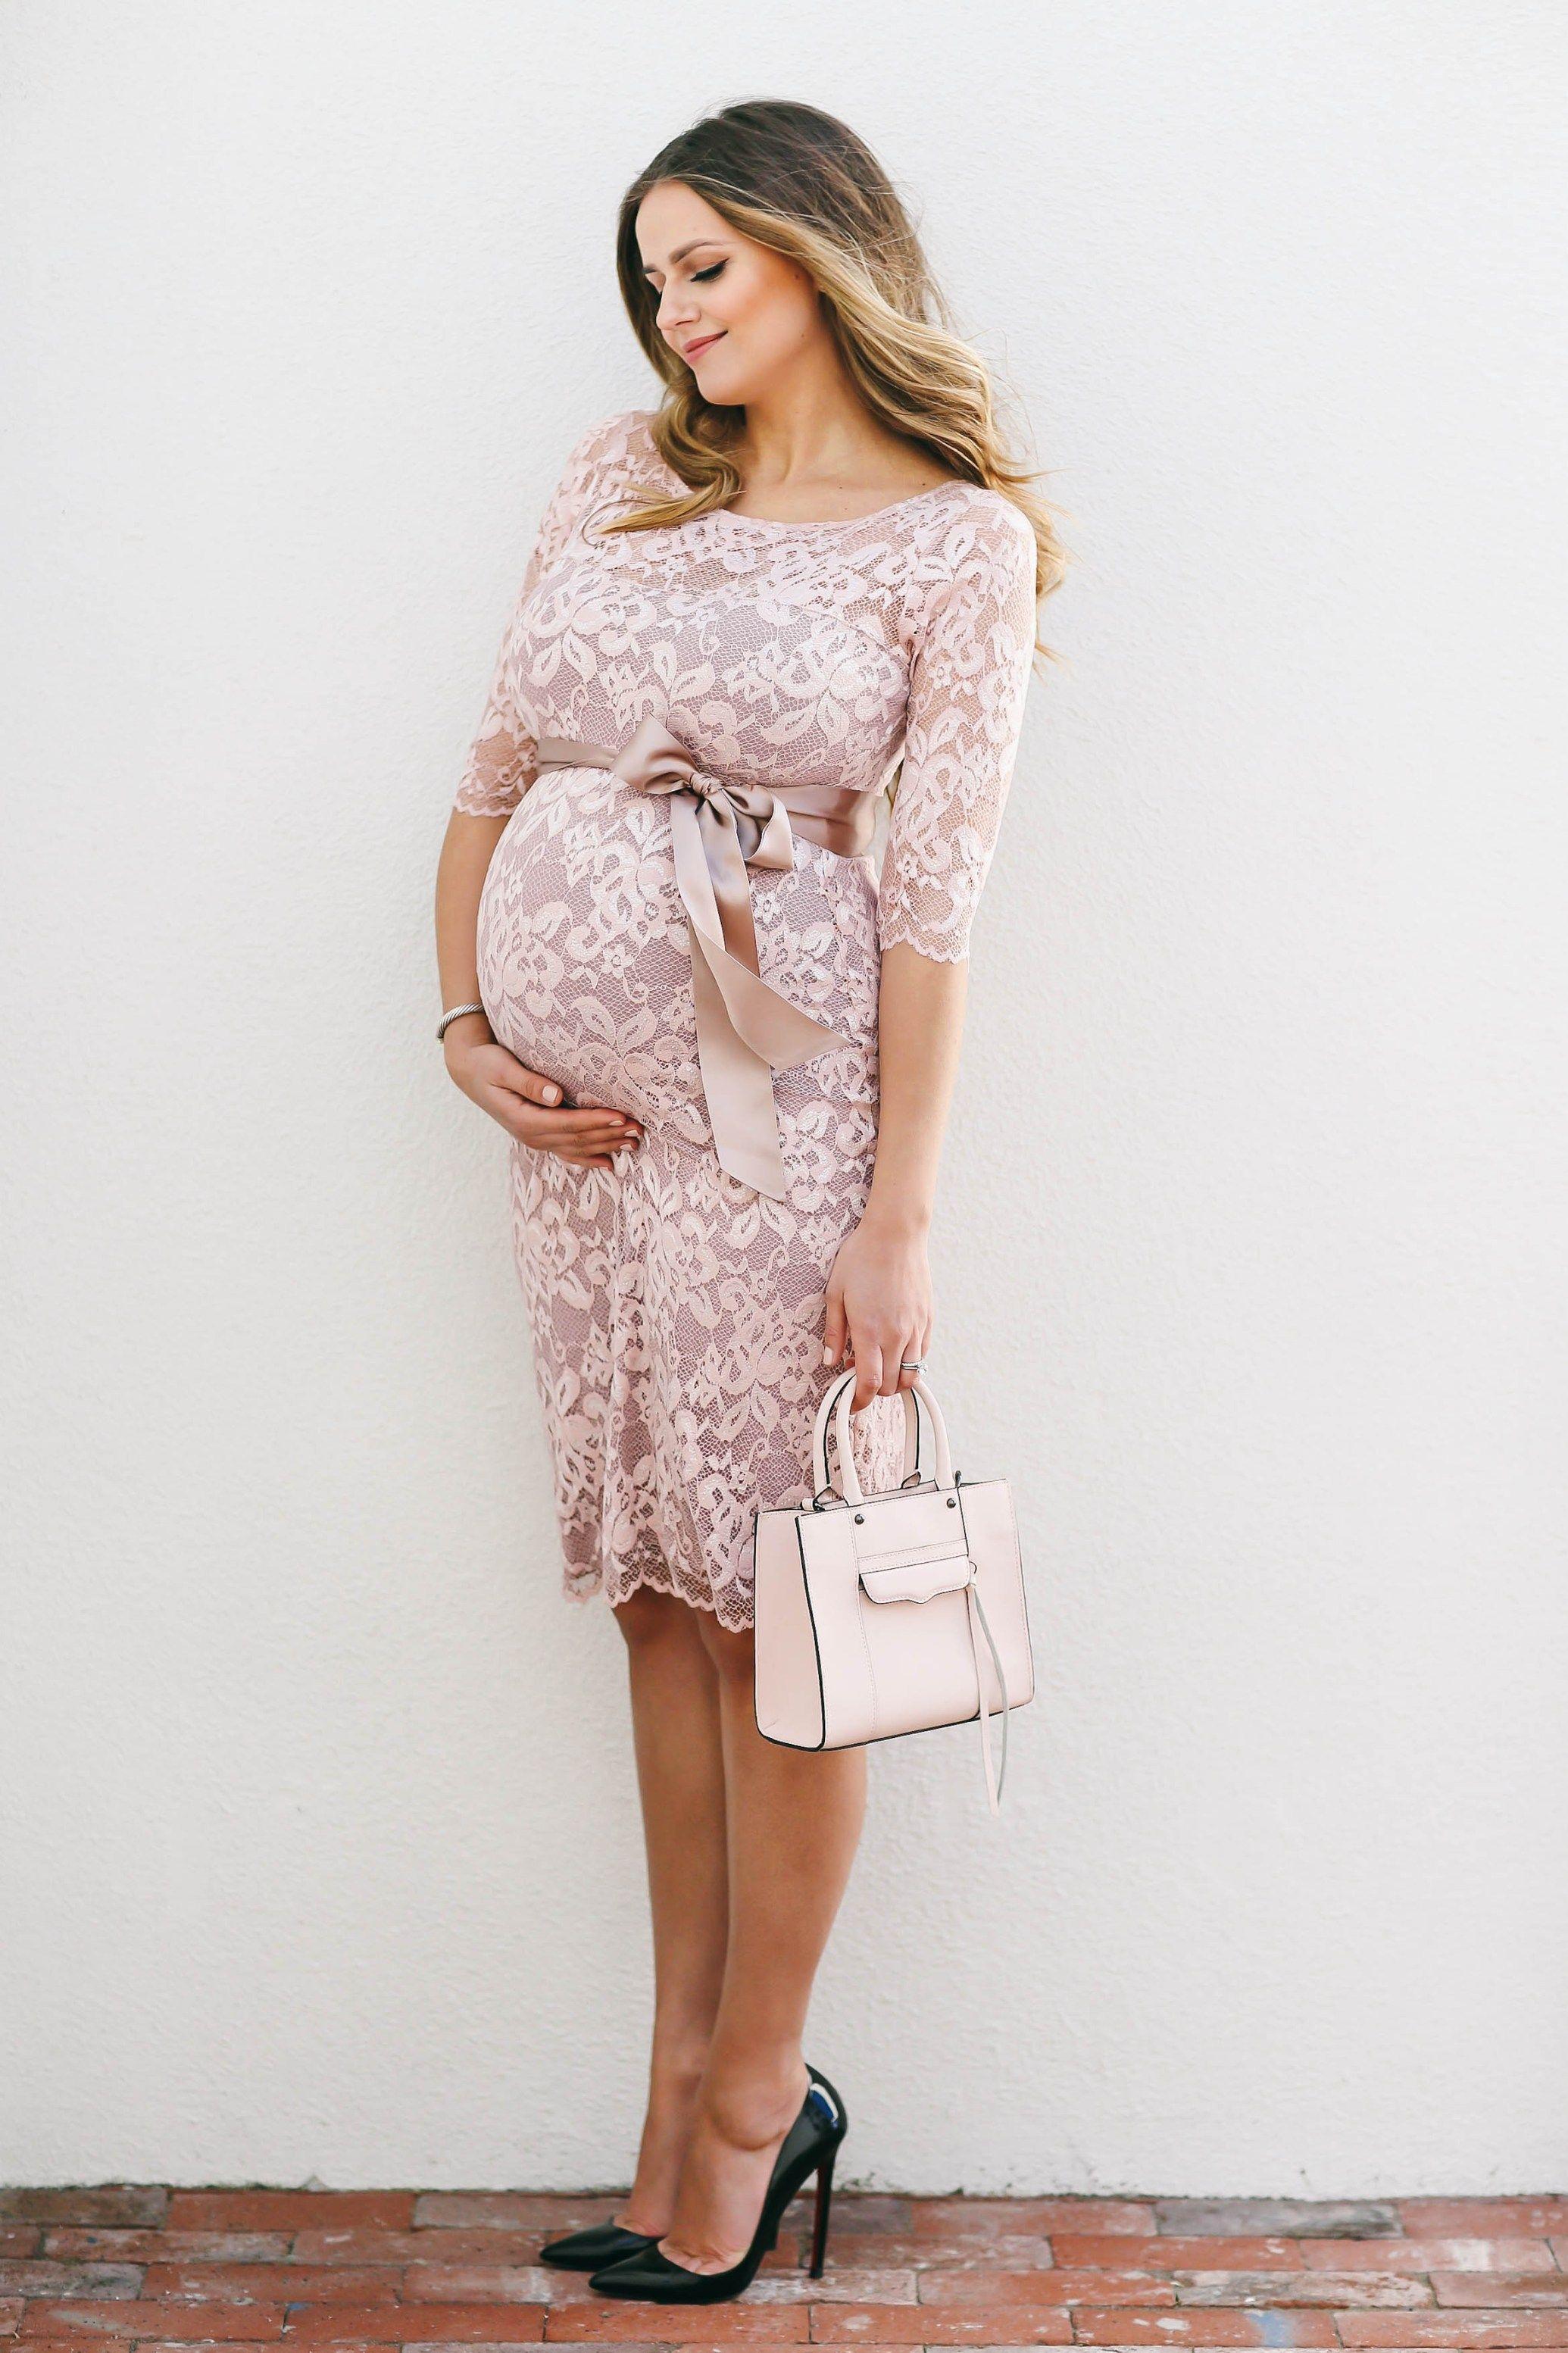 Bumpstyle blush pink lace maternity dress maternity dresses bumpstyle blush pink lace maternity dress bondgirlglam ombrellifo Image collections